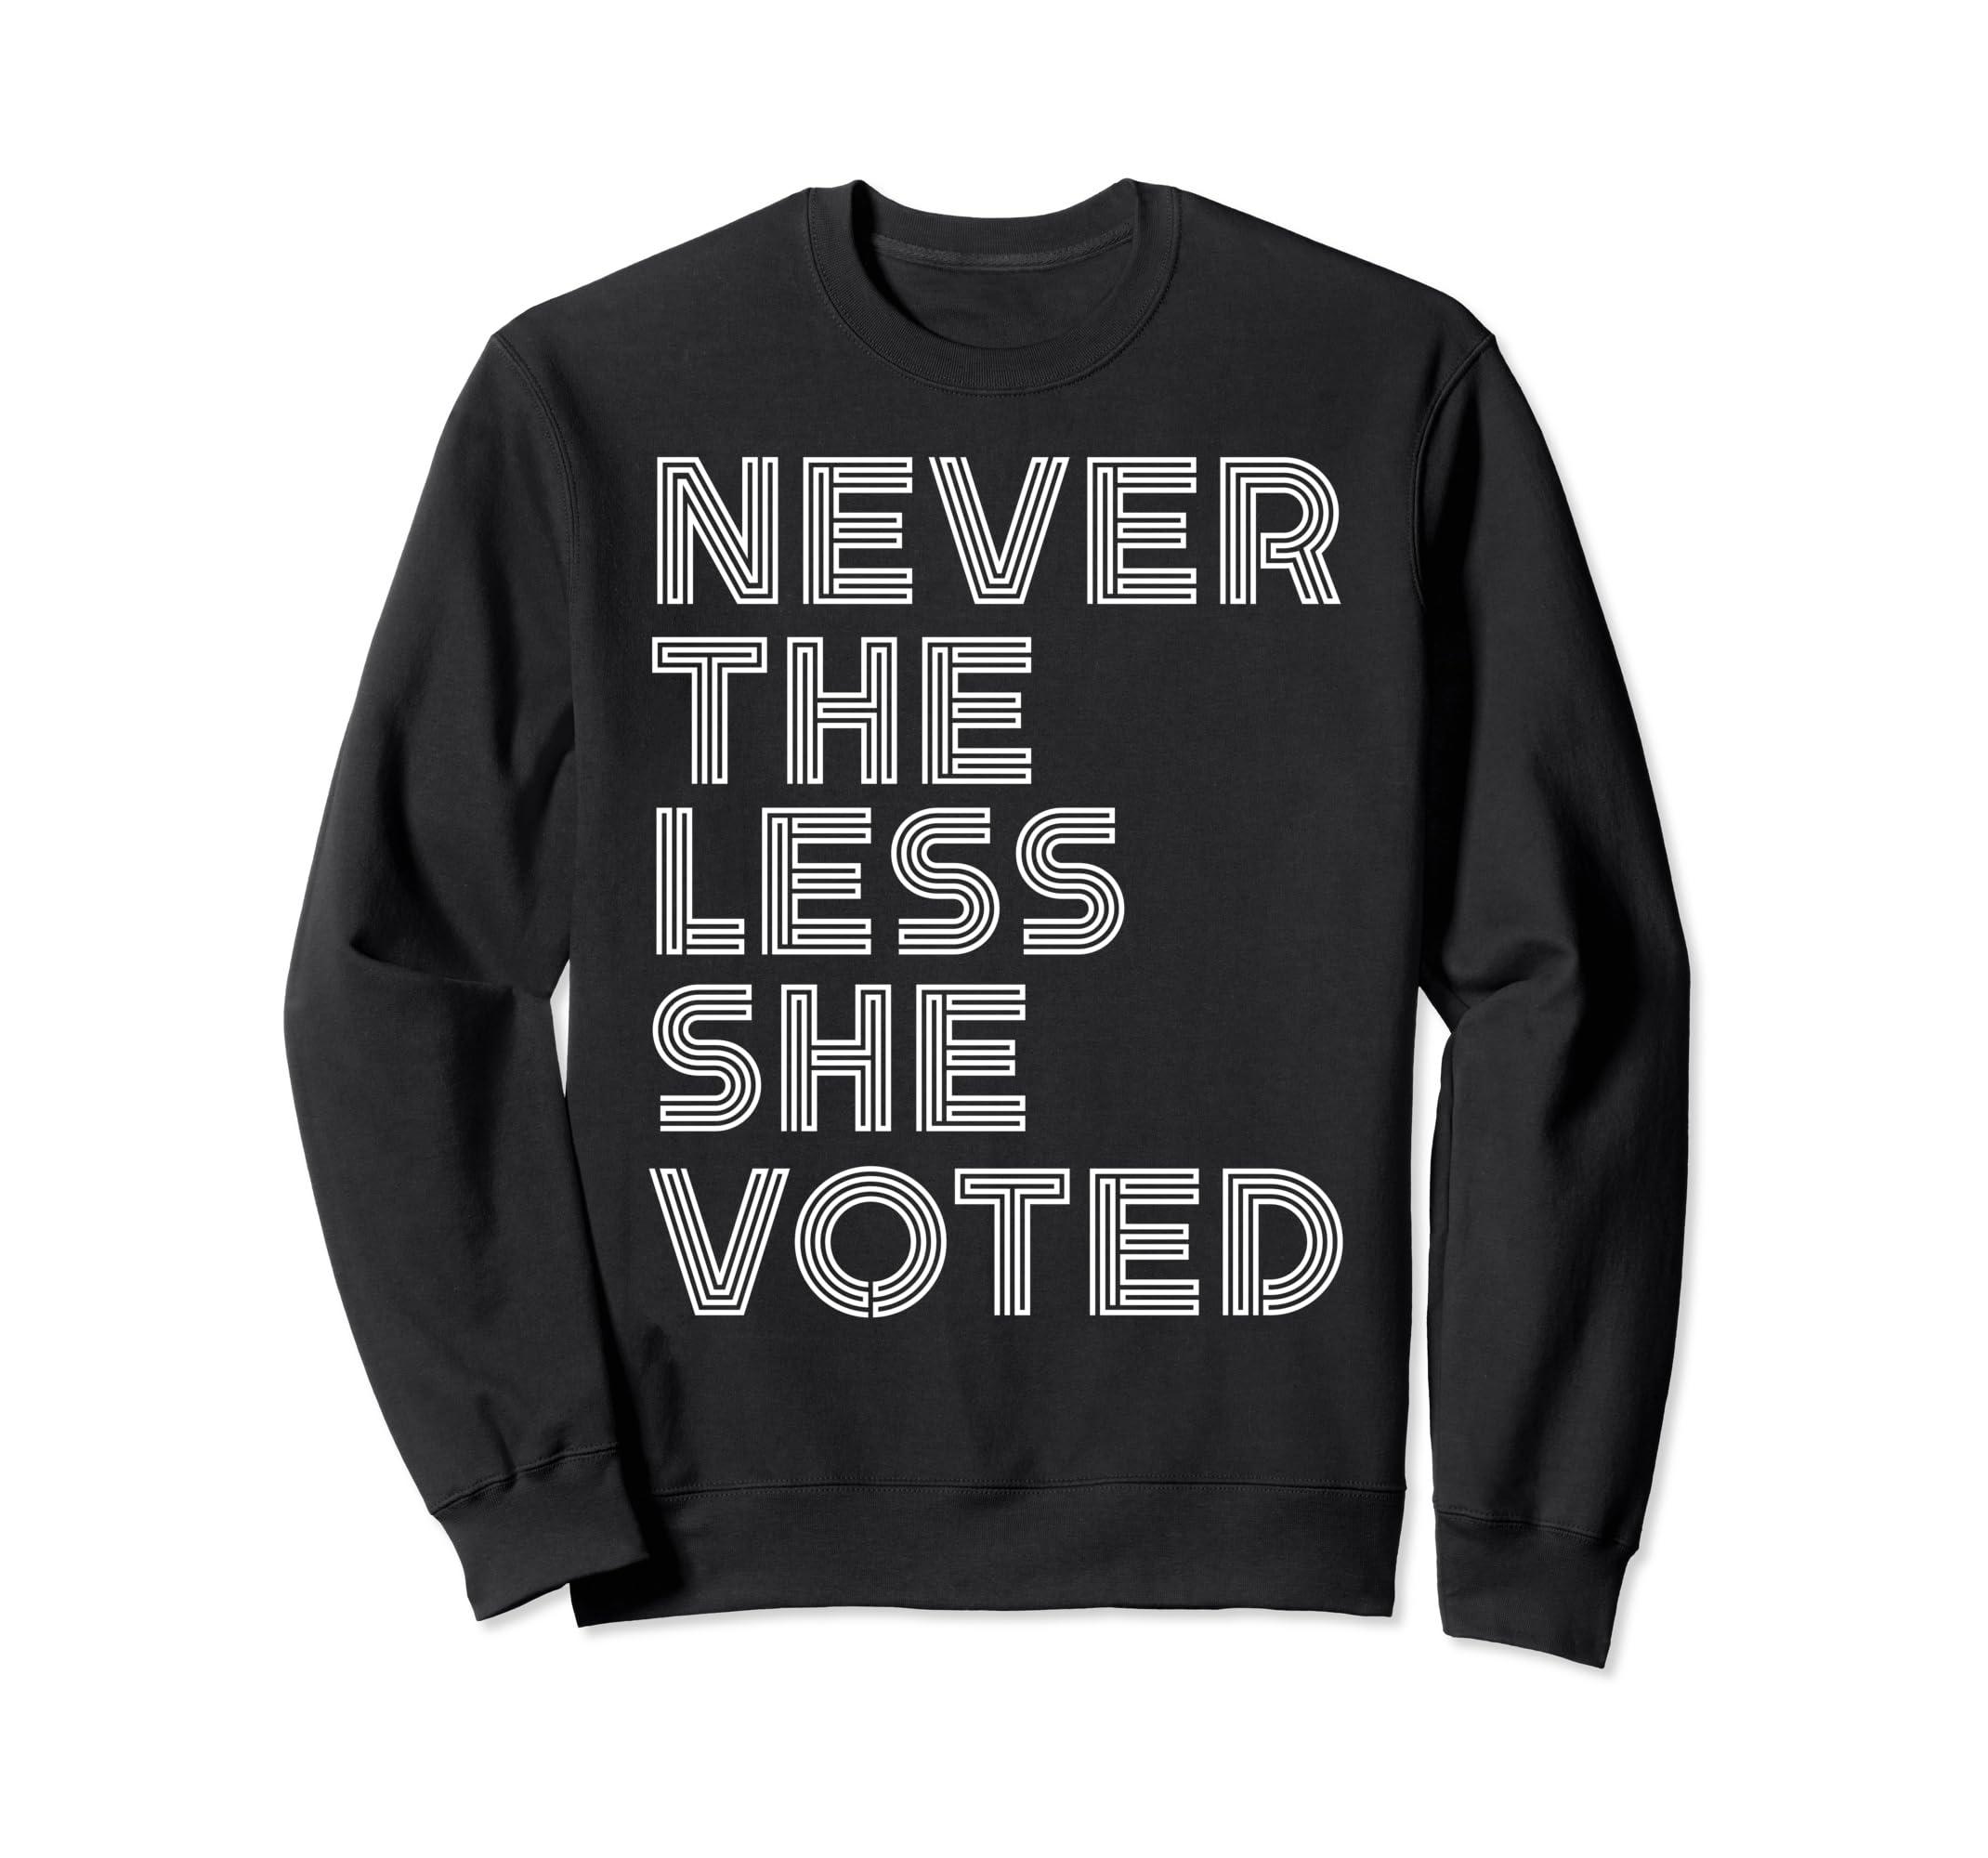 ceeb93df Amazon.com: Nevertheless She Voted Sweatshirt Feminist Midterm Election:  Clothing